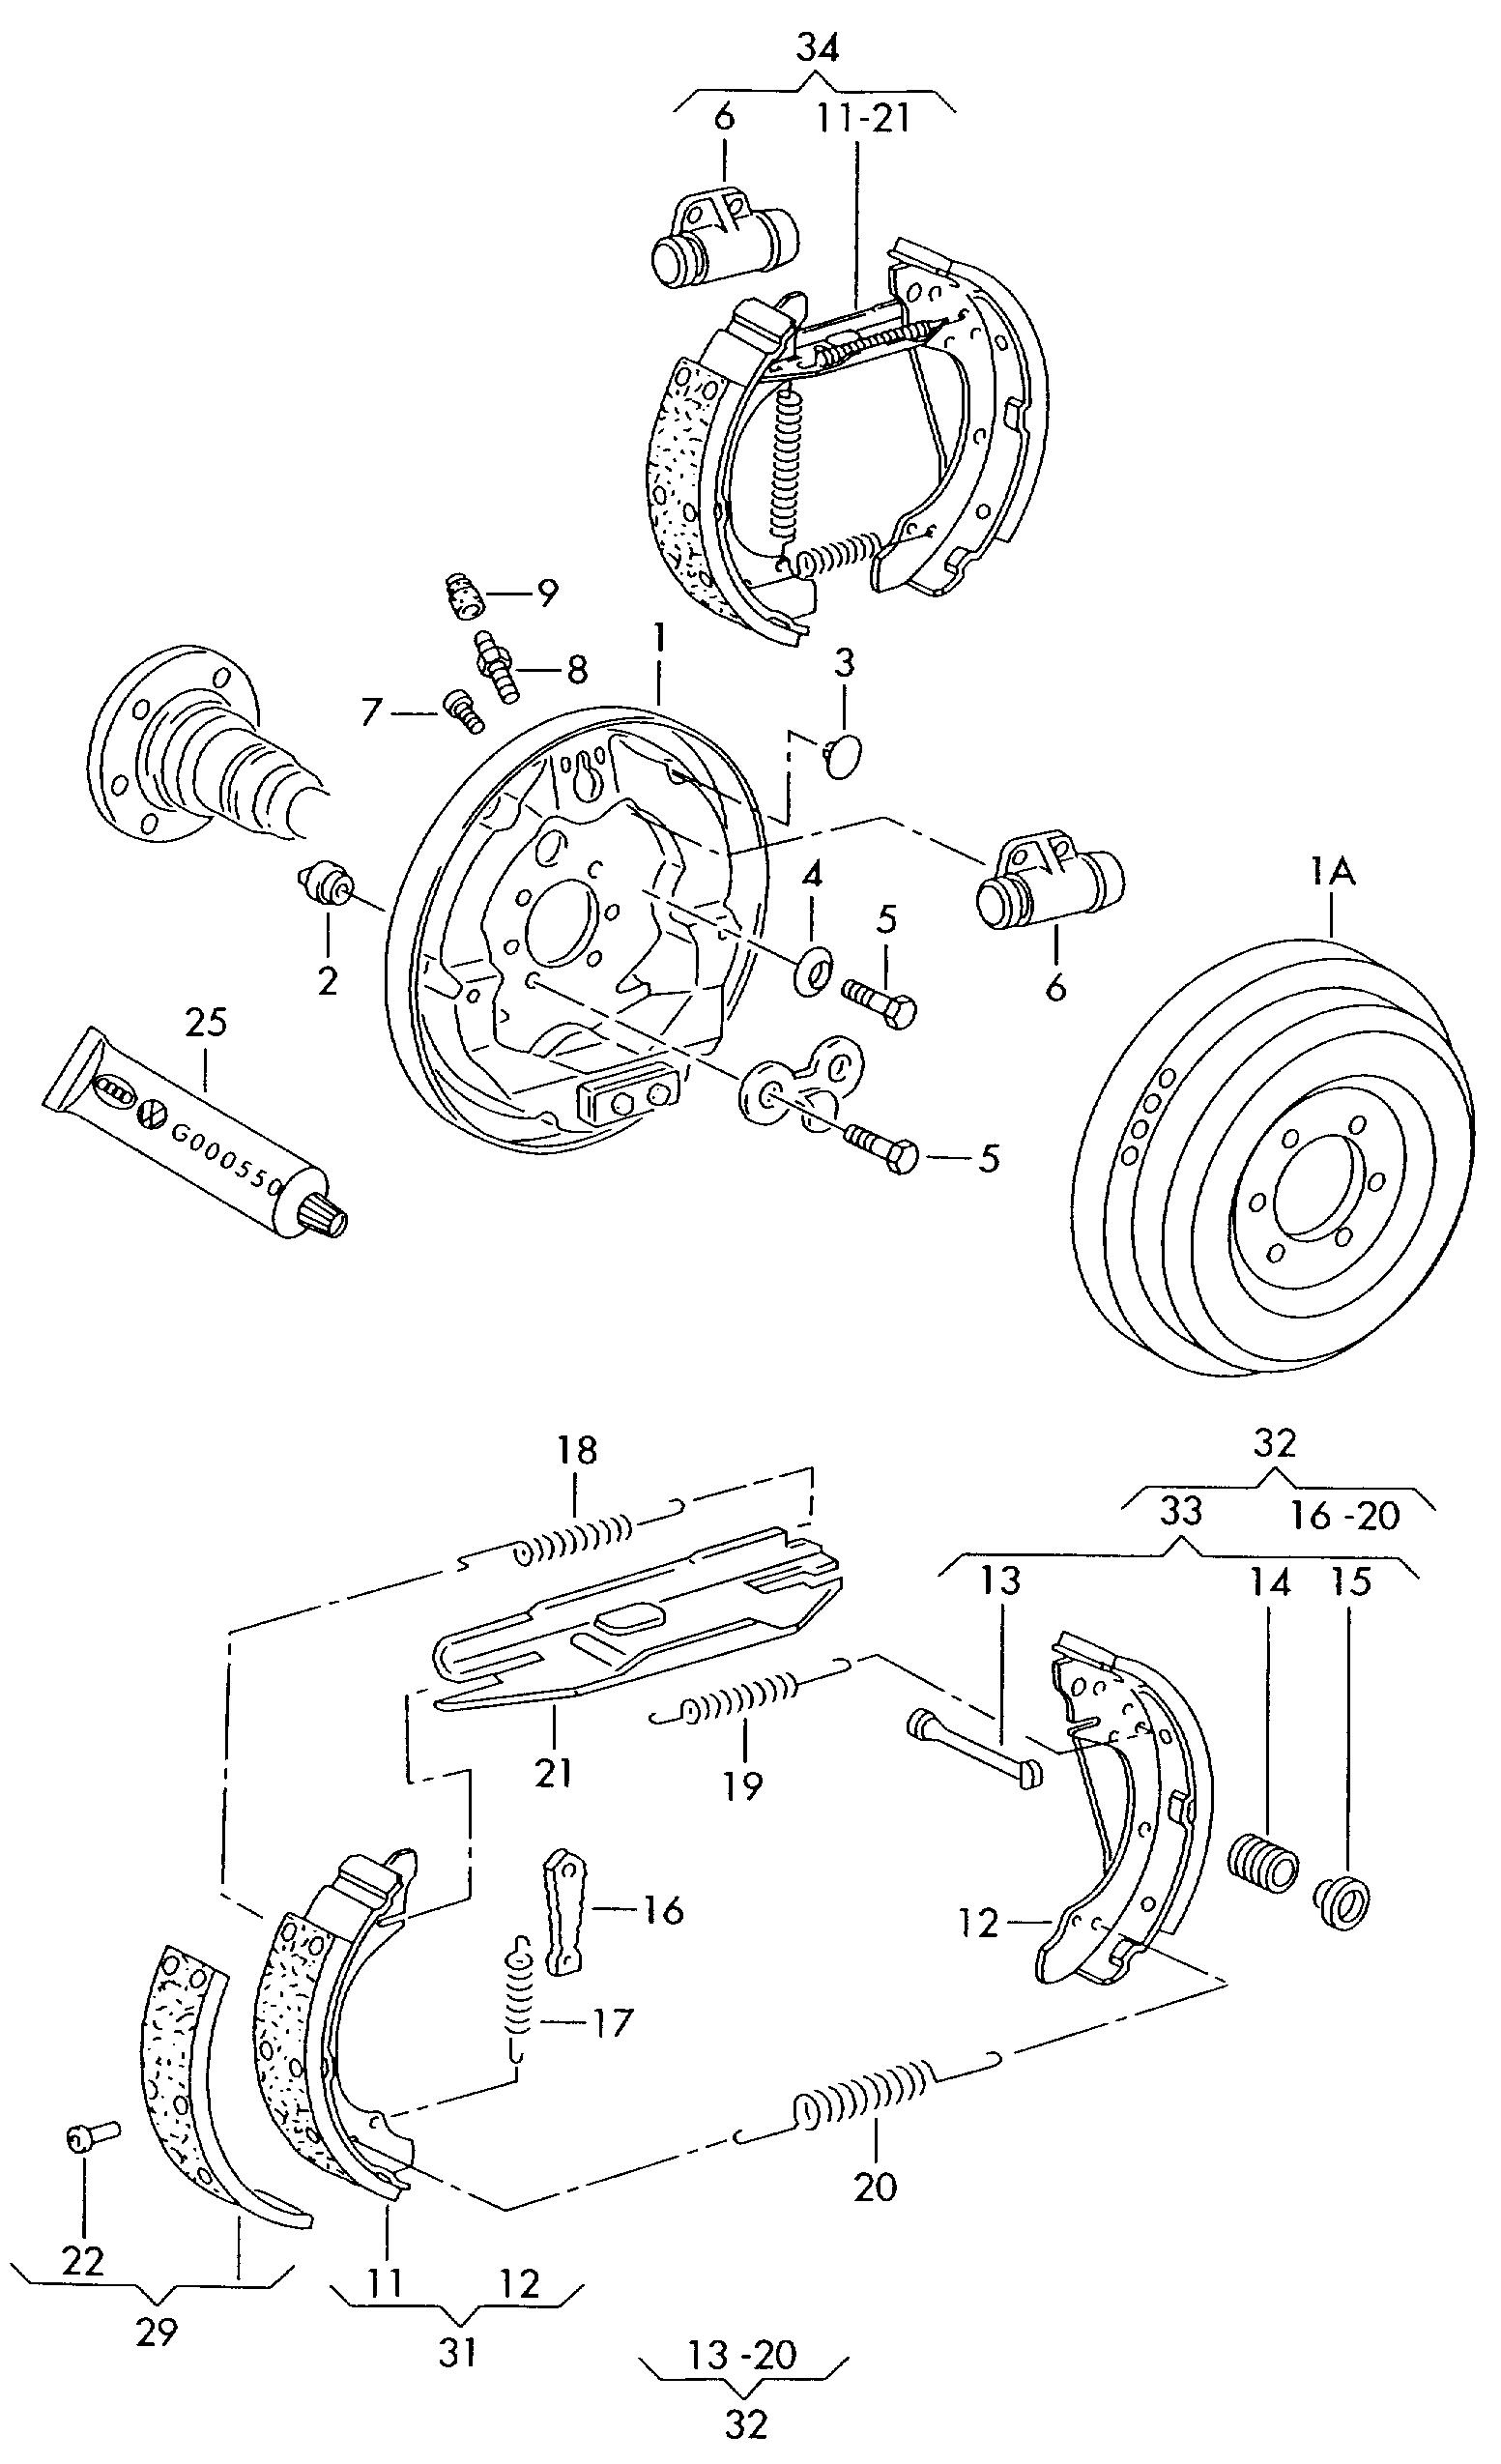 skoda brakes diagram best wiring library 1964 Mercury Monterey skoda fabia 2011 2015 vag etka